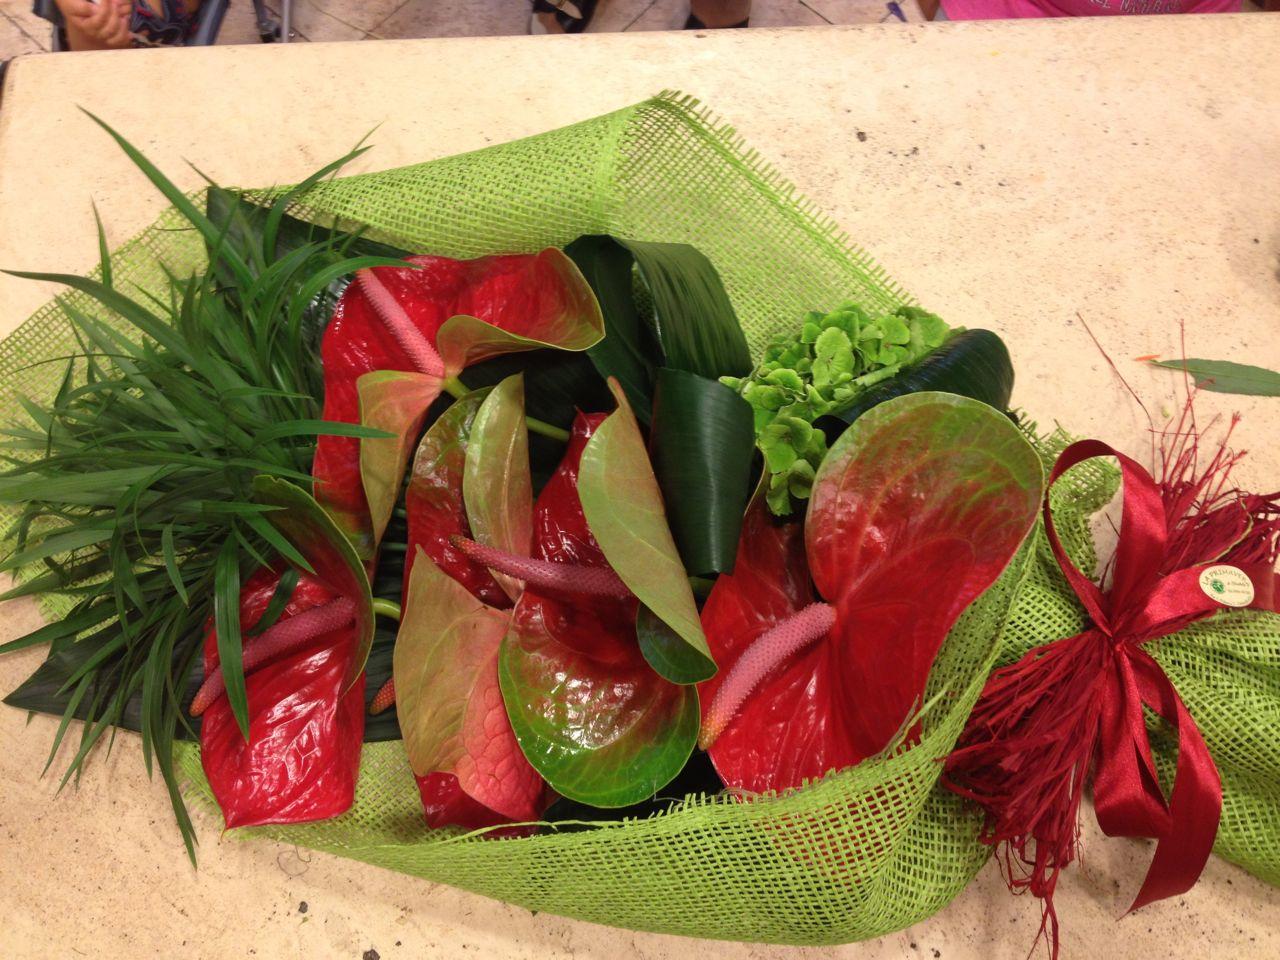 Elisabetta fiori e piante fascetto di anthurium rossi for Anthurium rosso